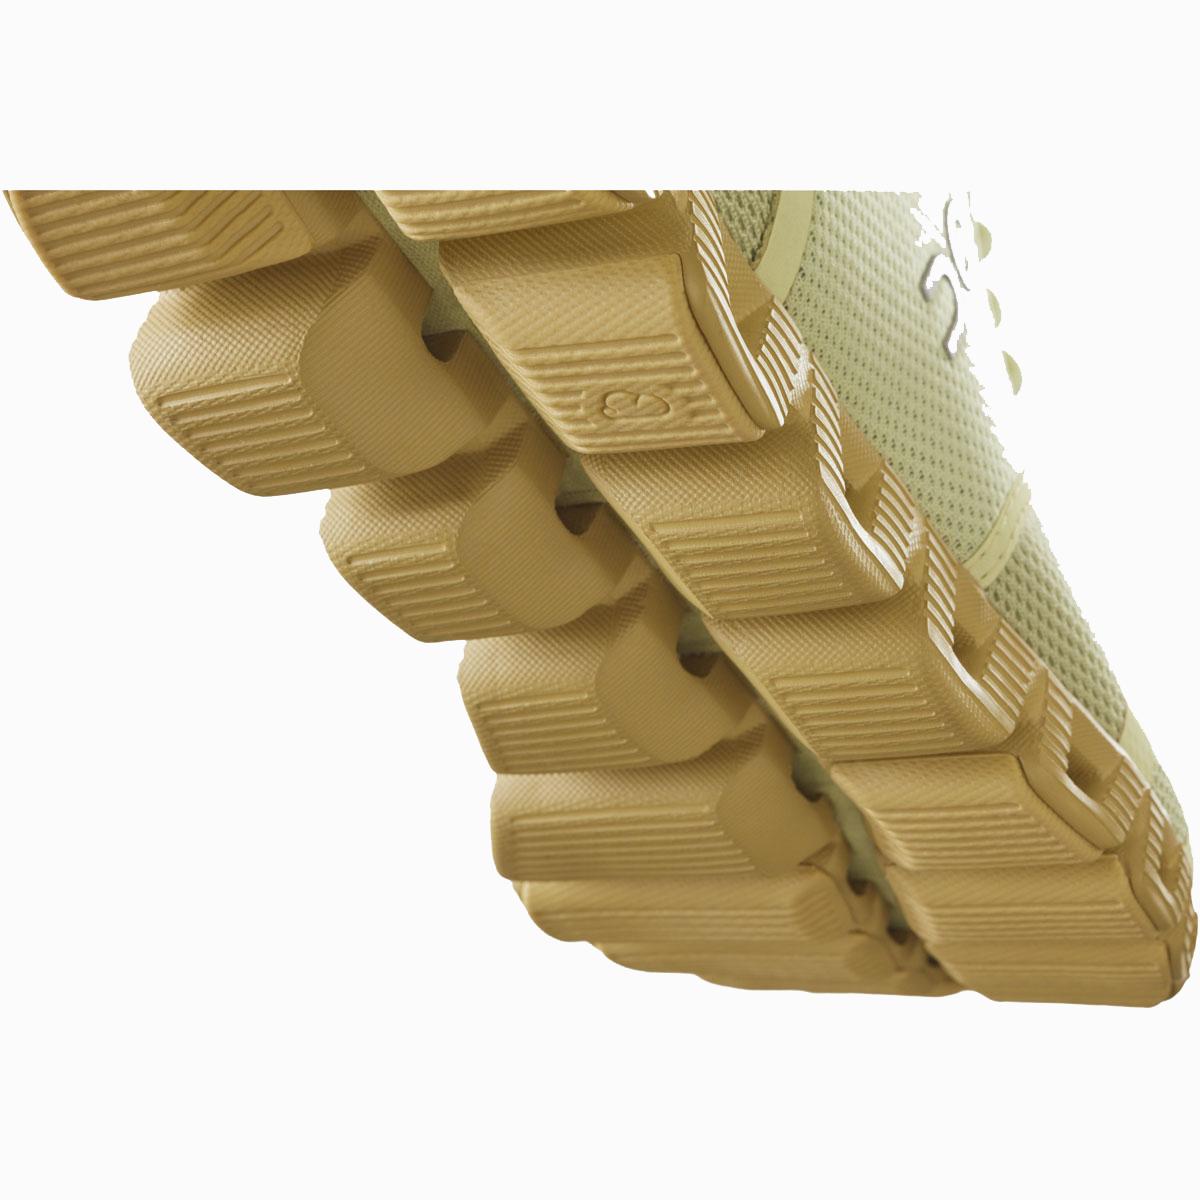 Women's On Cloud Monochrome Running Shoe - Color: Endive - Size: 5 - Width: Regular, Endive, large, image 5